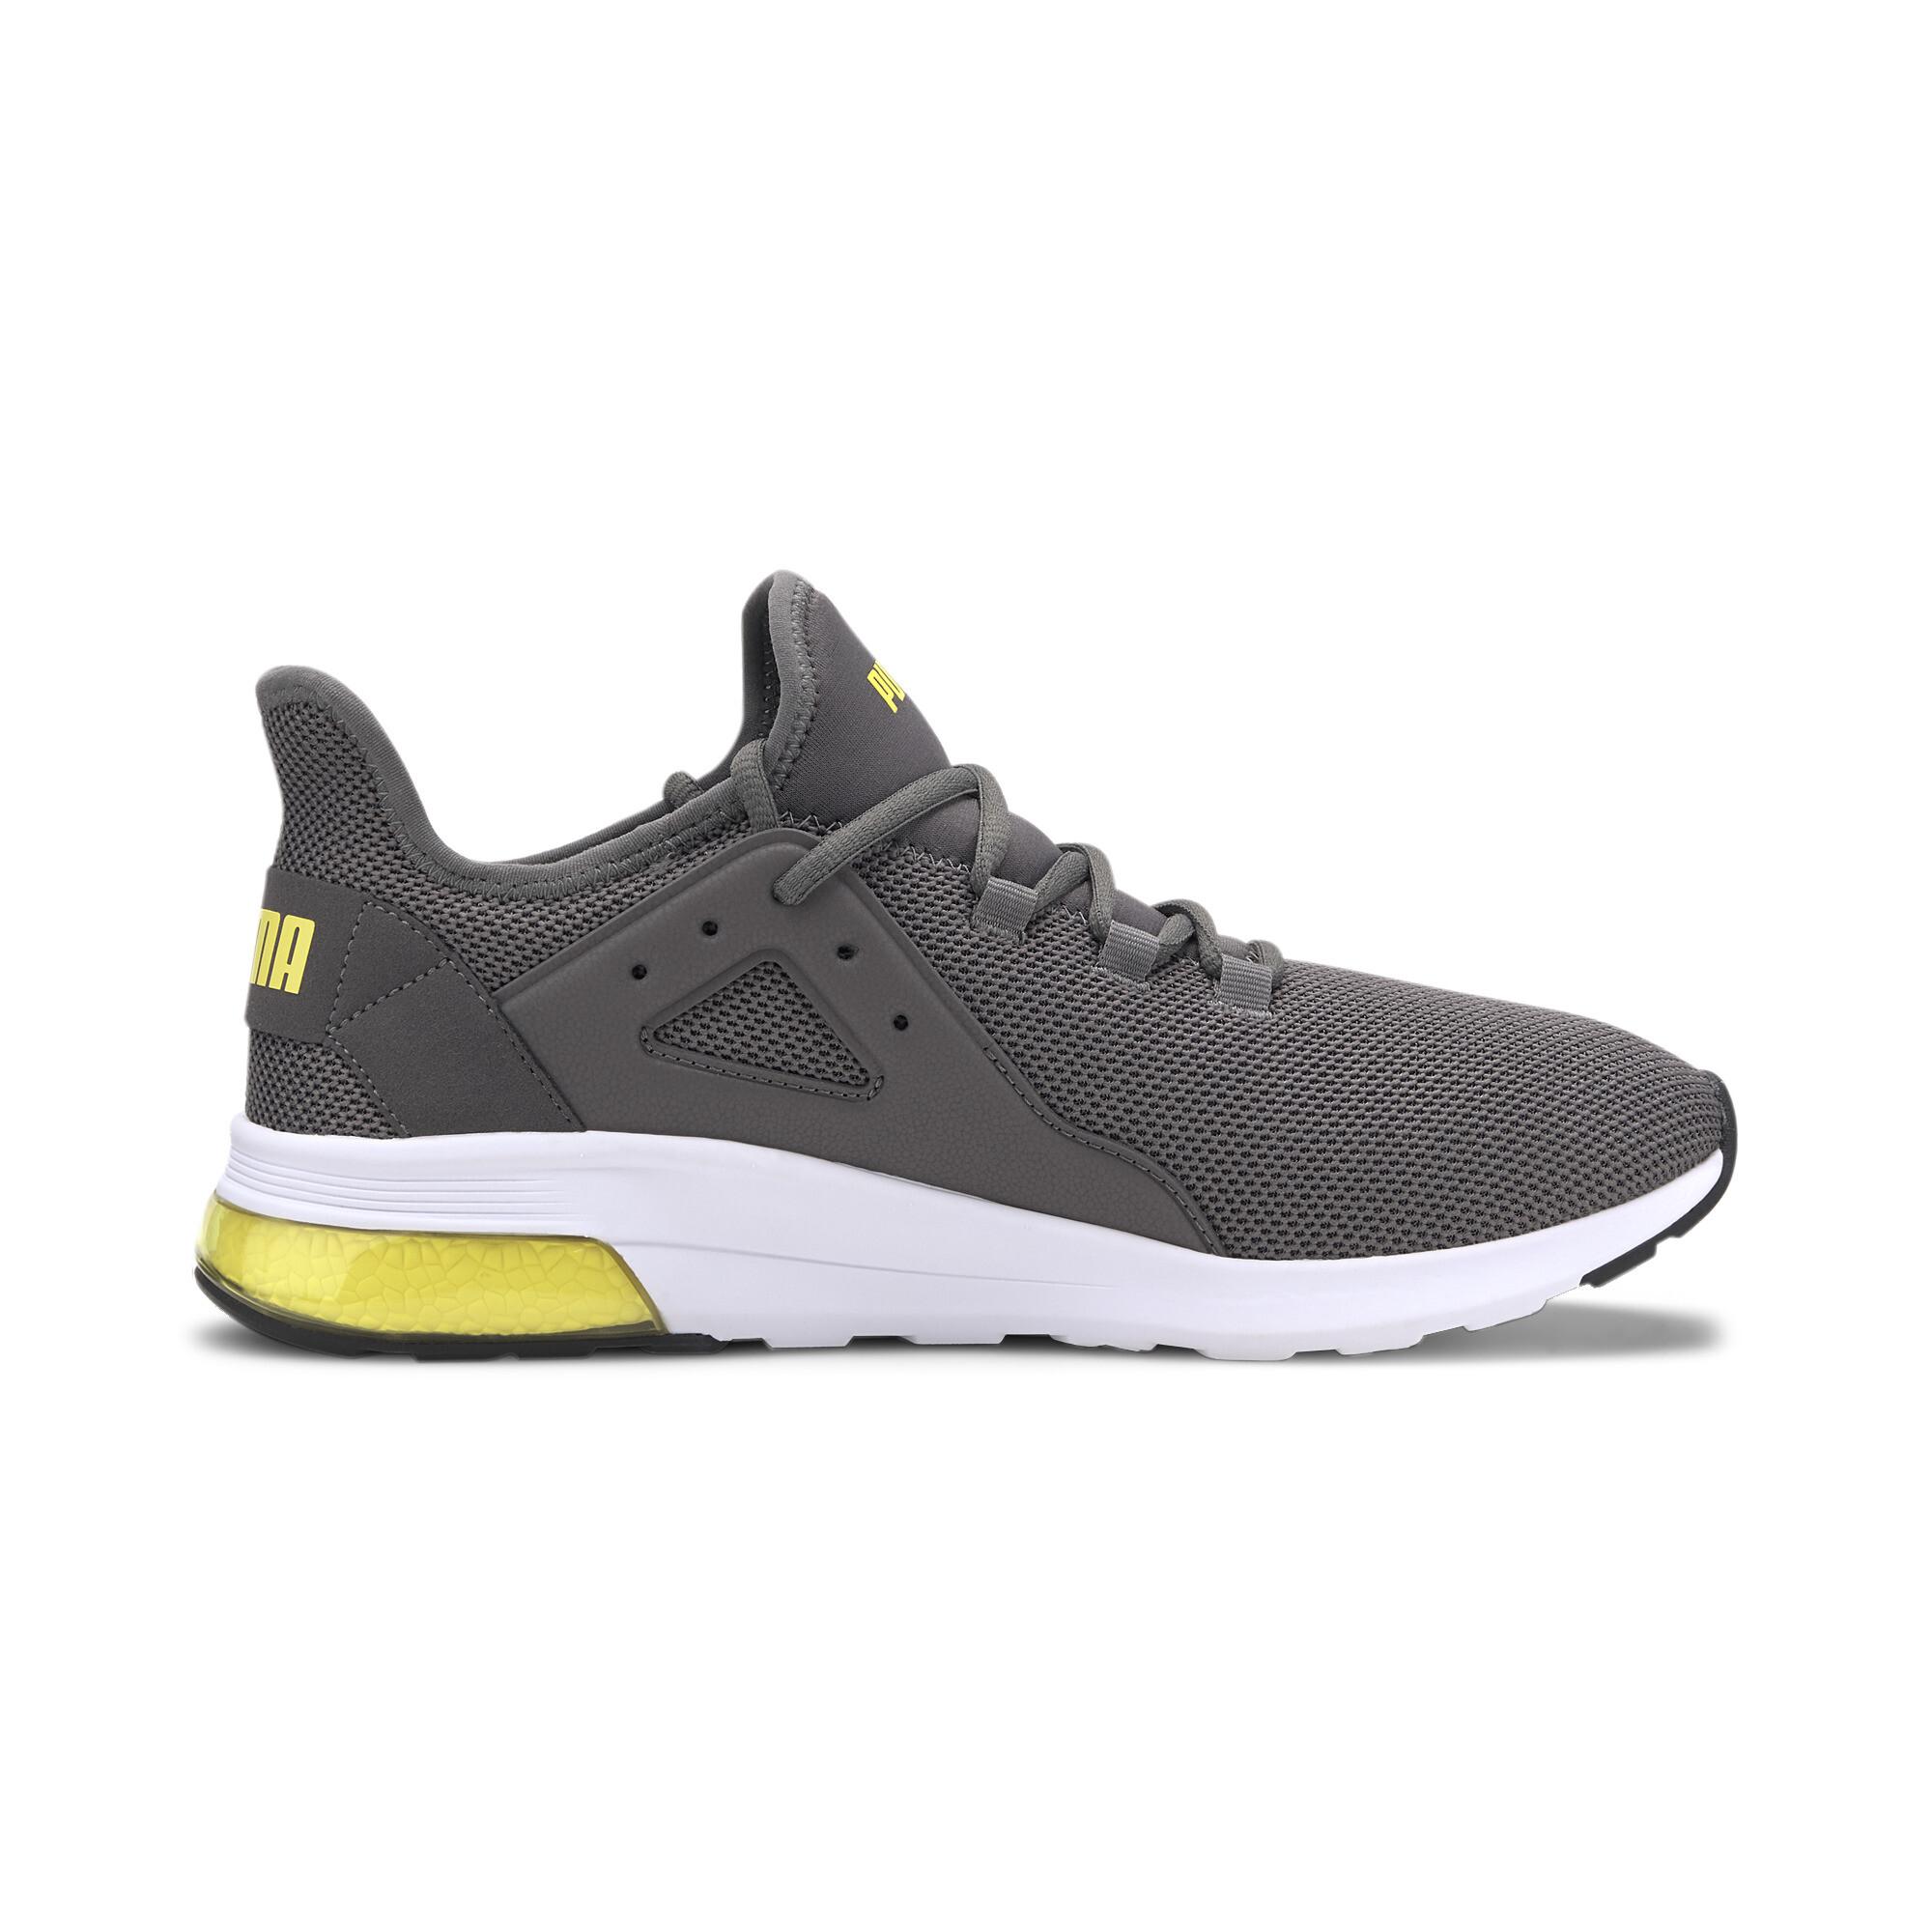 PUMA-Electron-Street-Men-039-s-Sneakers-Men-Shoe-Basics thumbnail 26